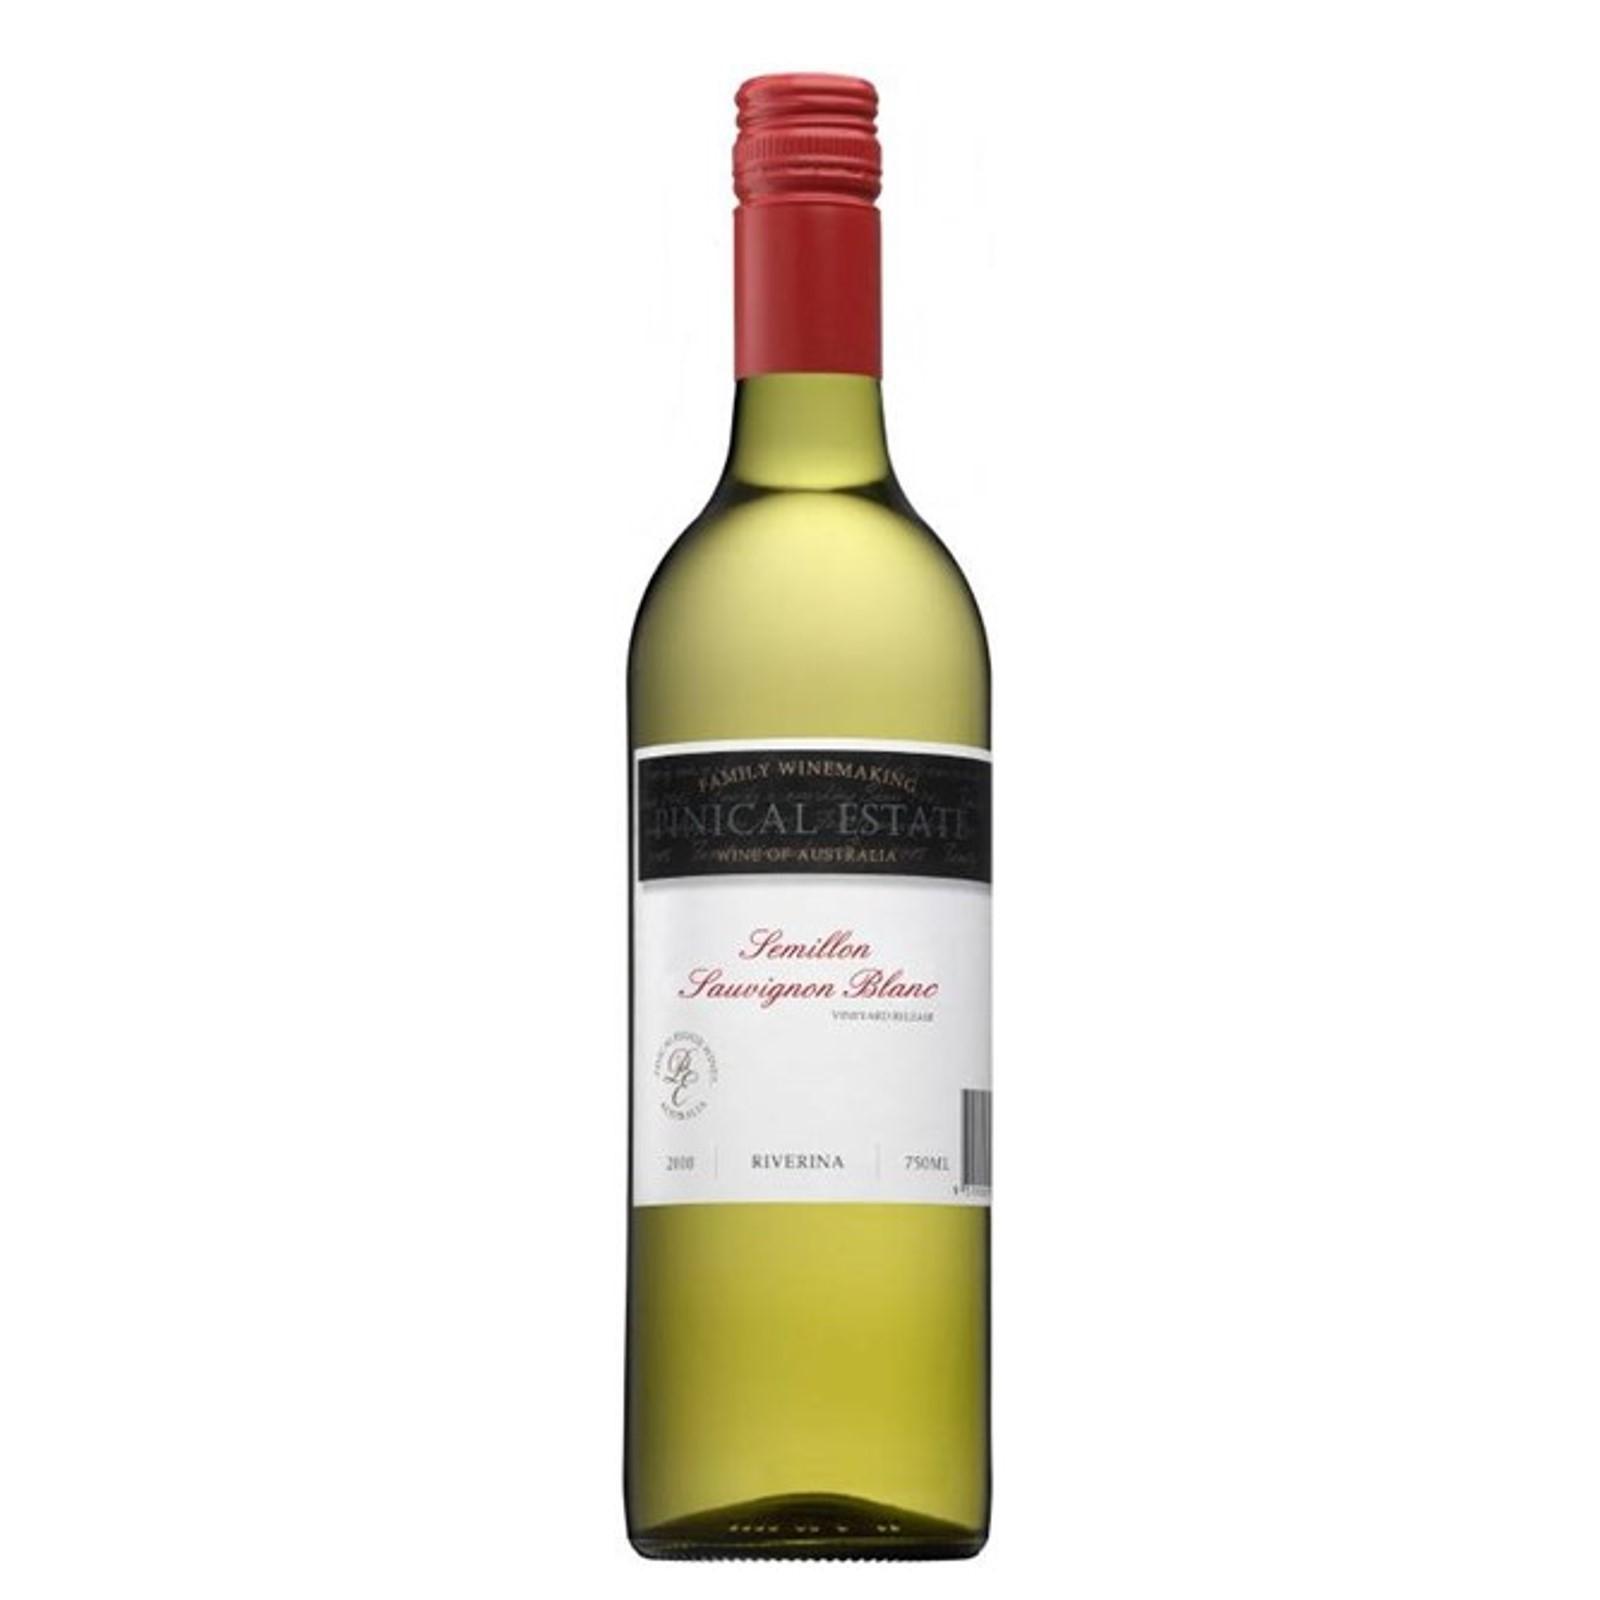 Pinical Estate Semillon Sauvignon Blanc